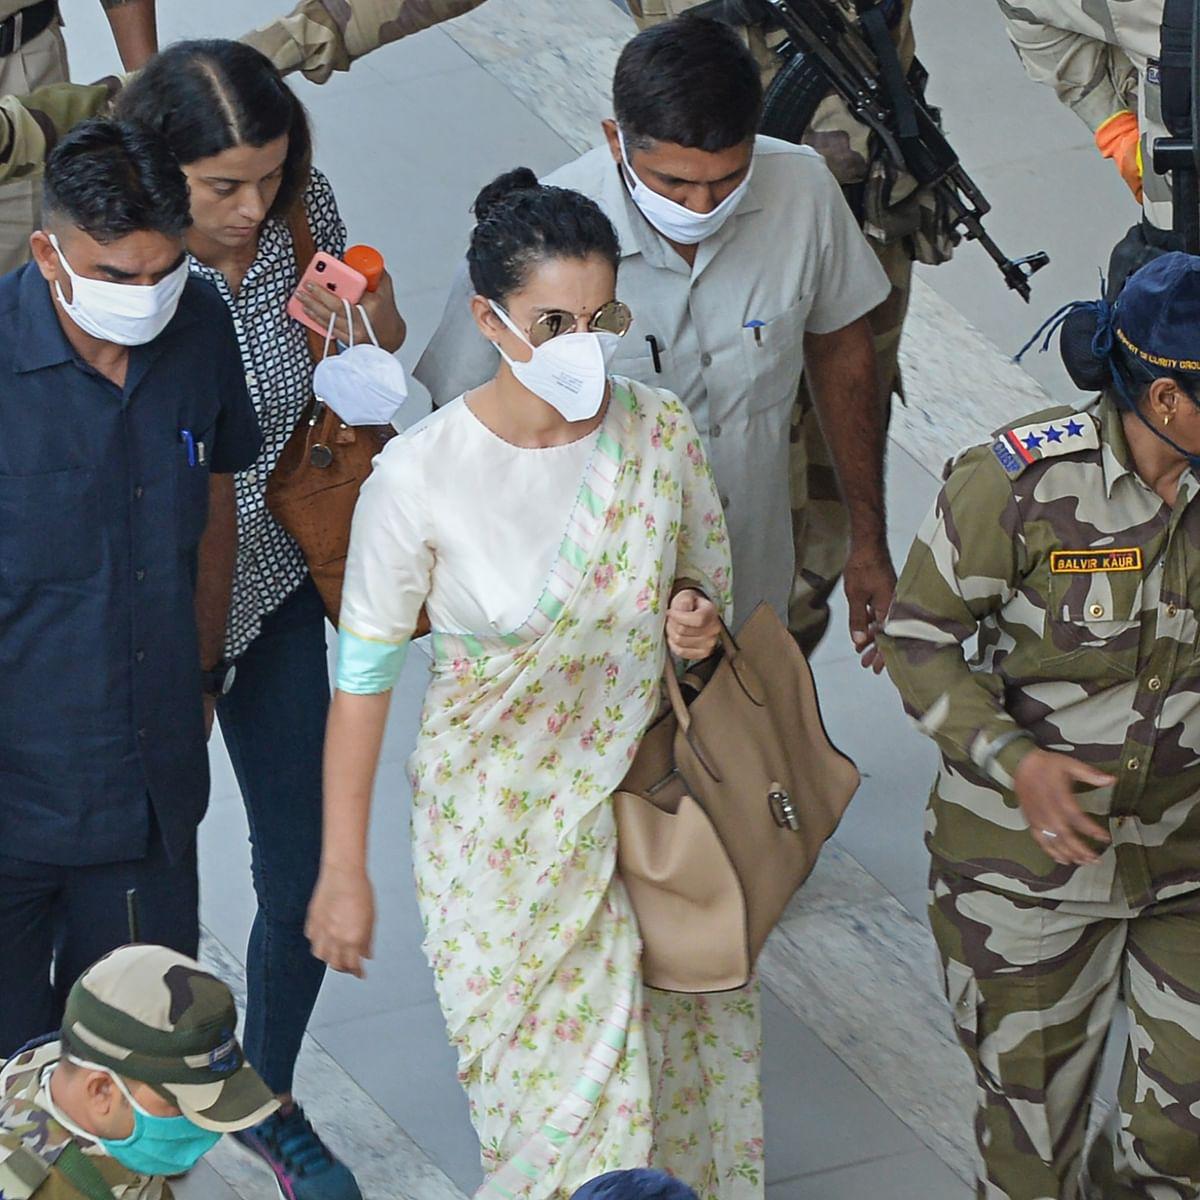 'People have stopped eating, drinking': Twitter bids farewell to Kangana as she leaves Mumbai